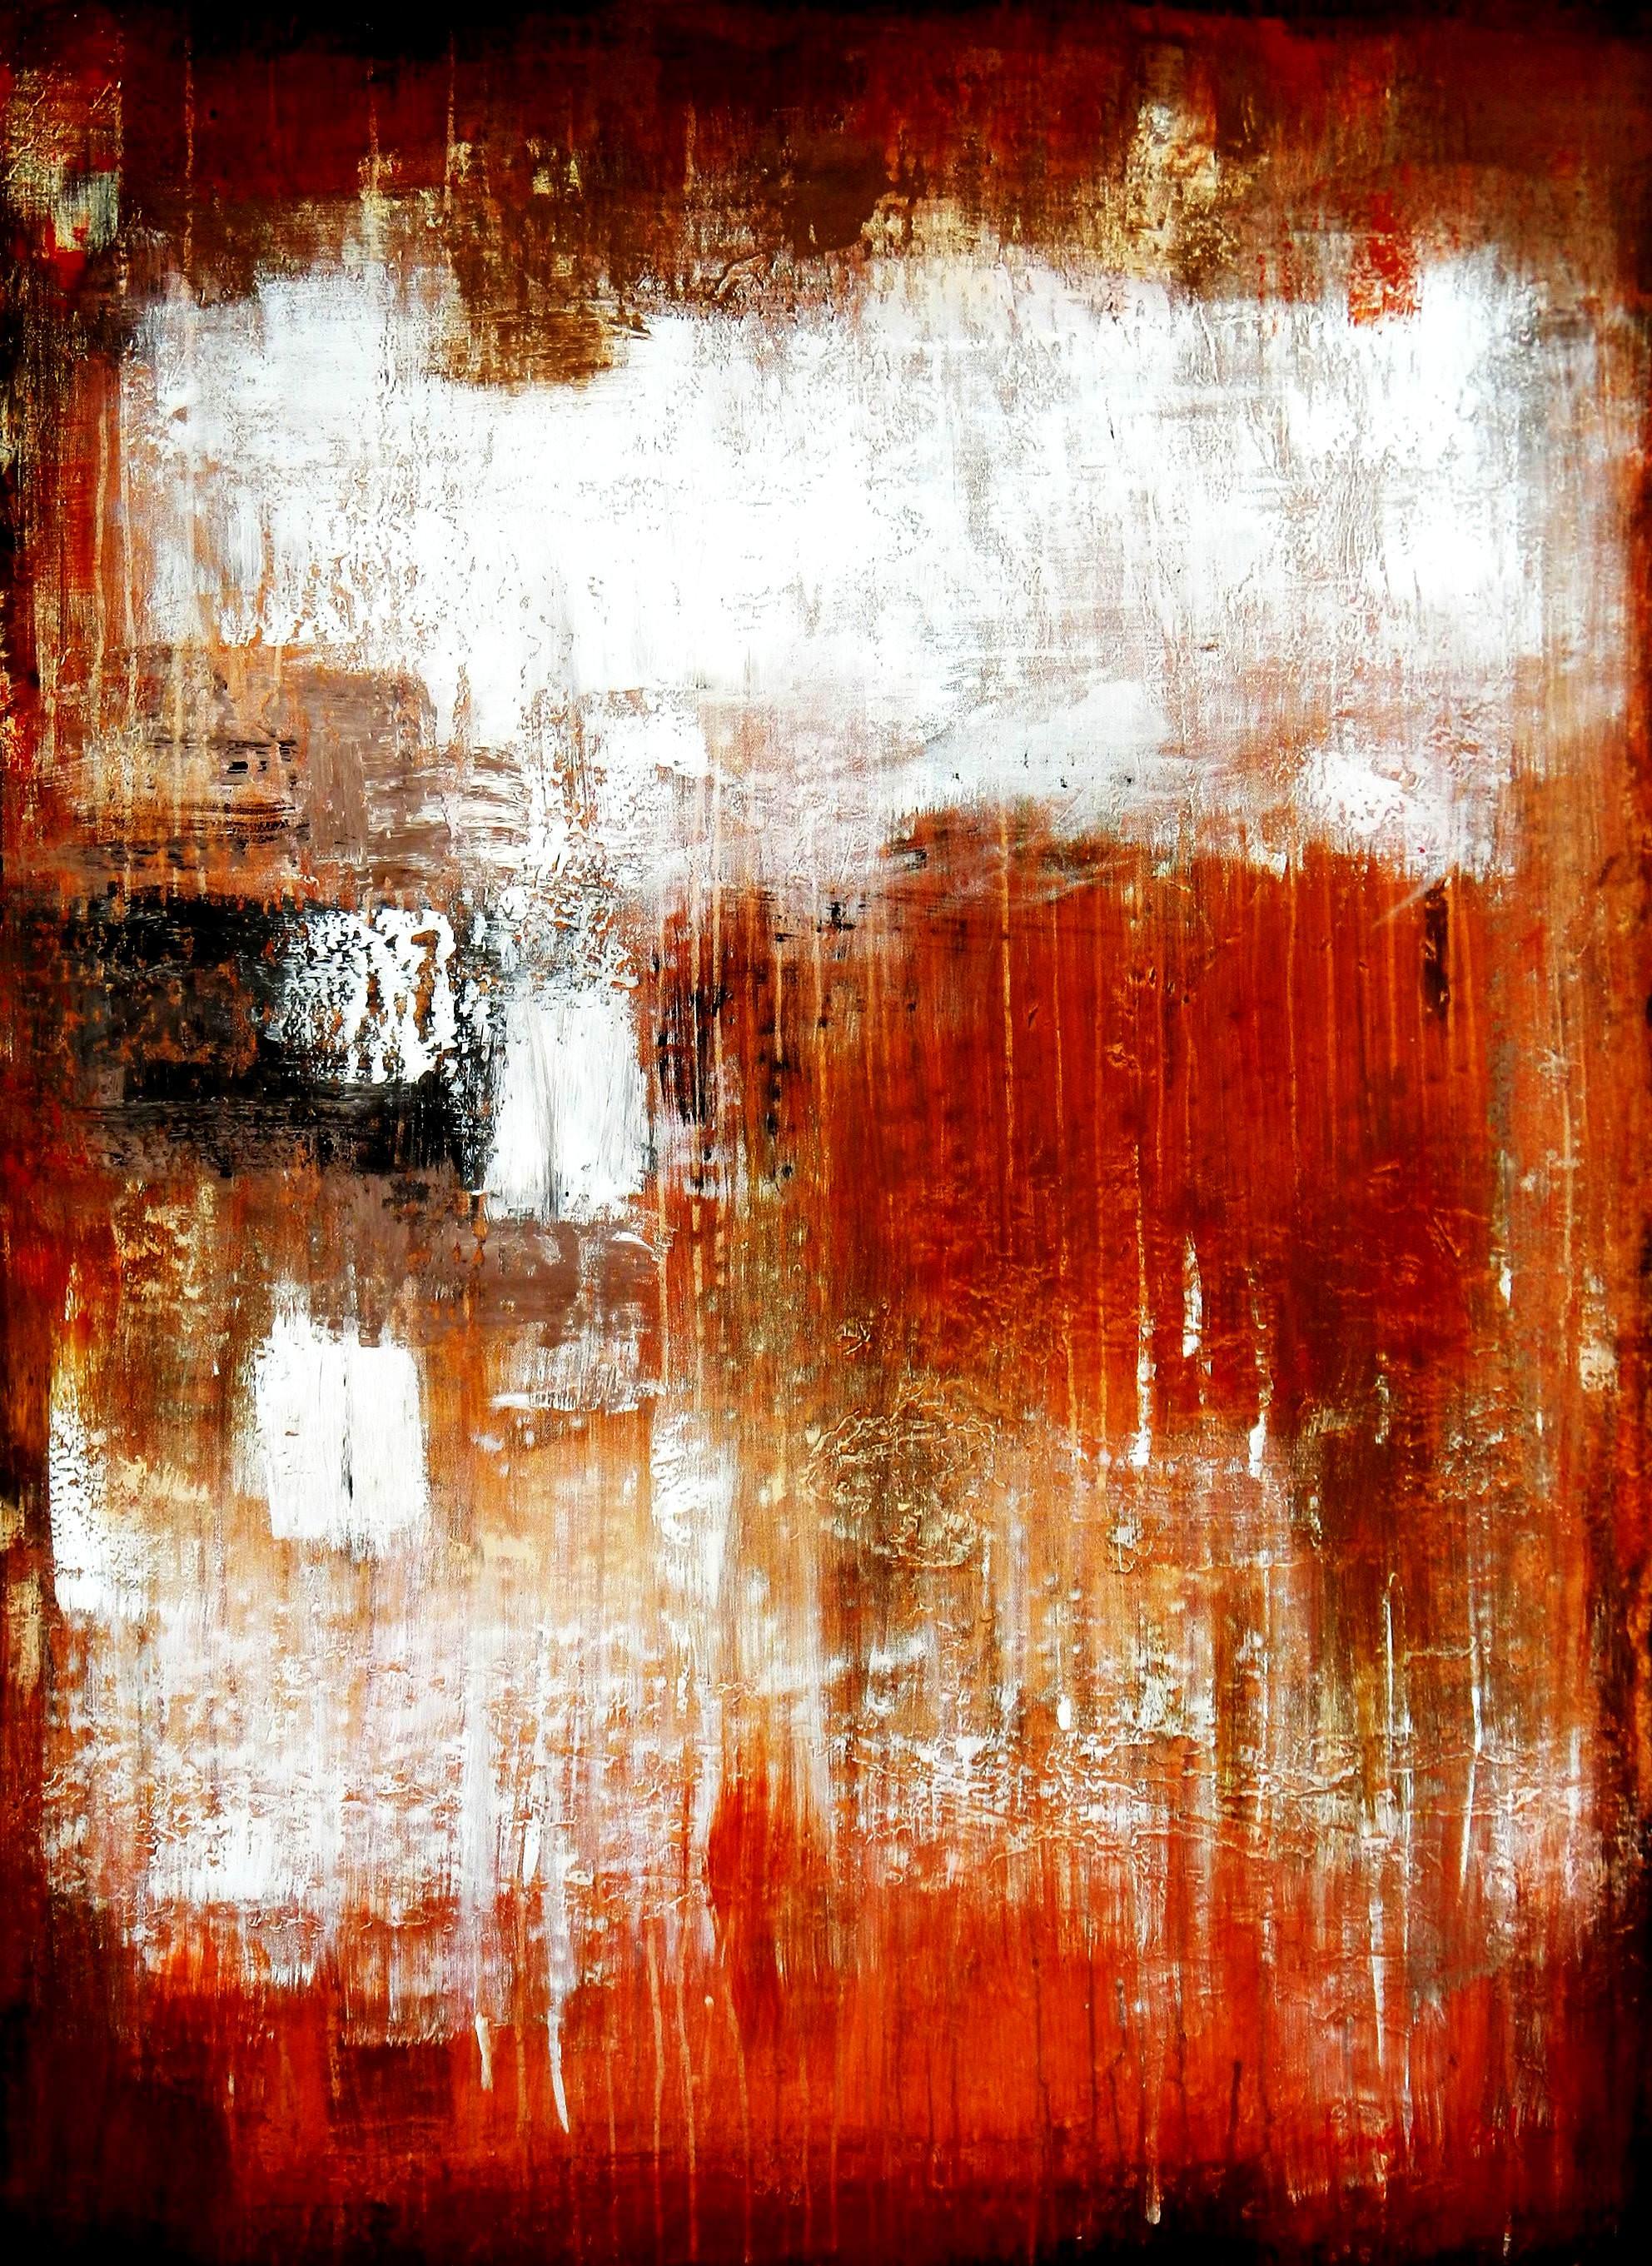 Abstract - Legacy of Fire V i96106 80x110cm abstraktes Ölbild handgemalt